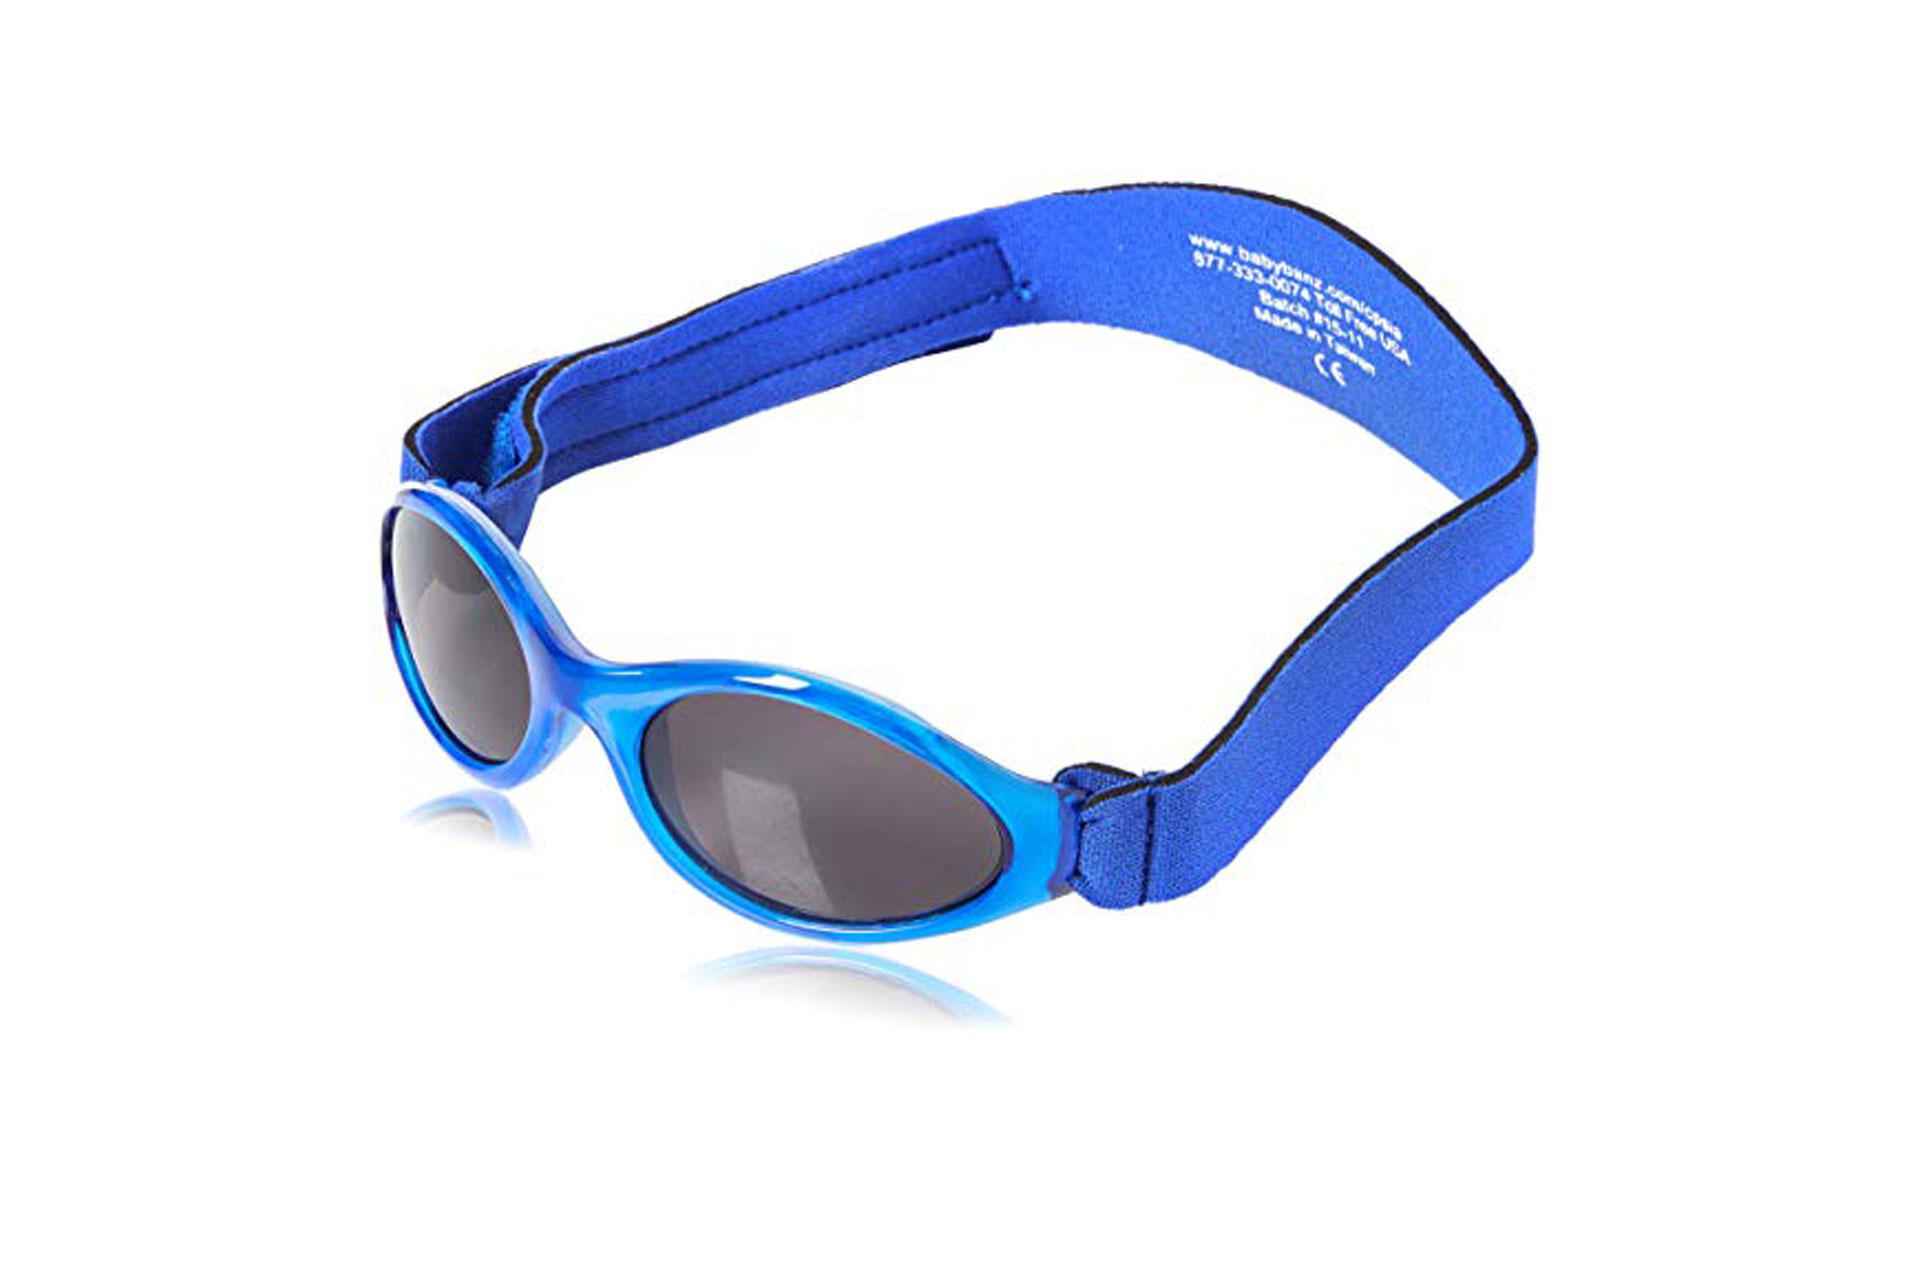 Baby Banz Sunglasses; Courtesy of Amazon